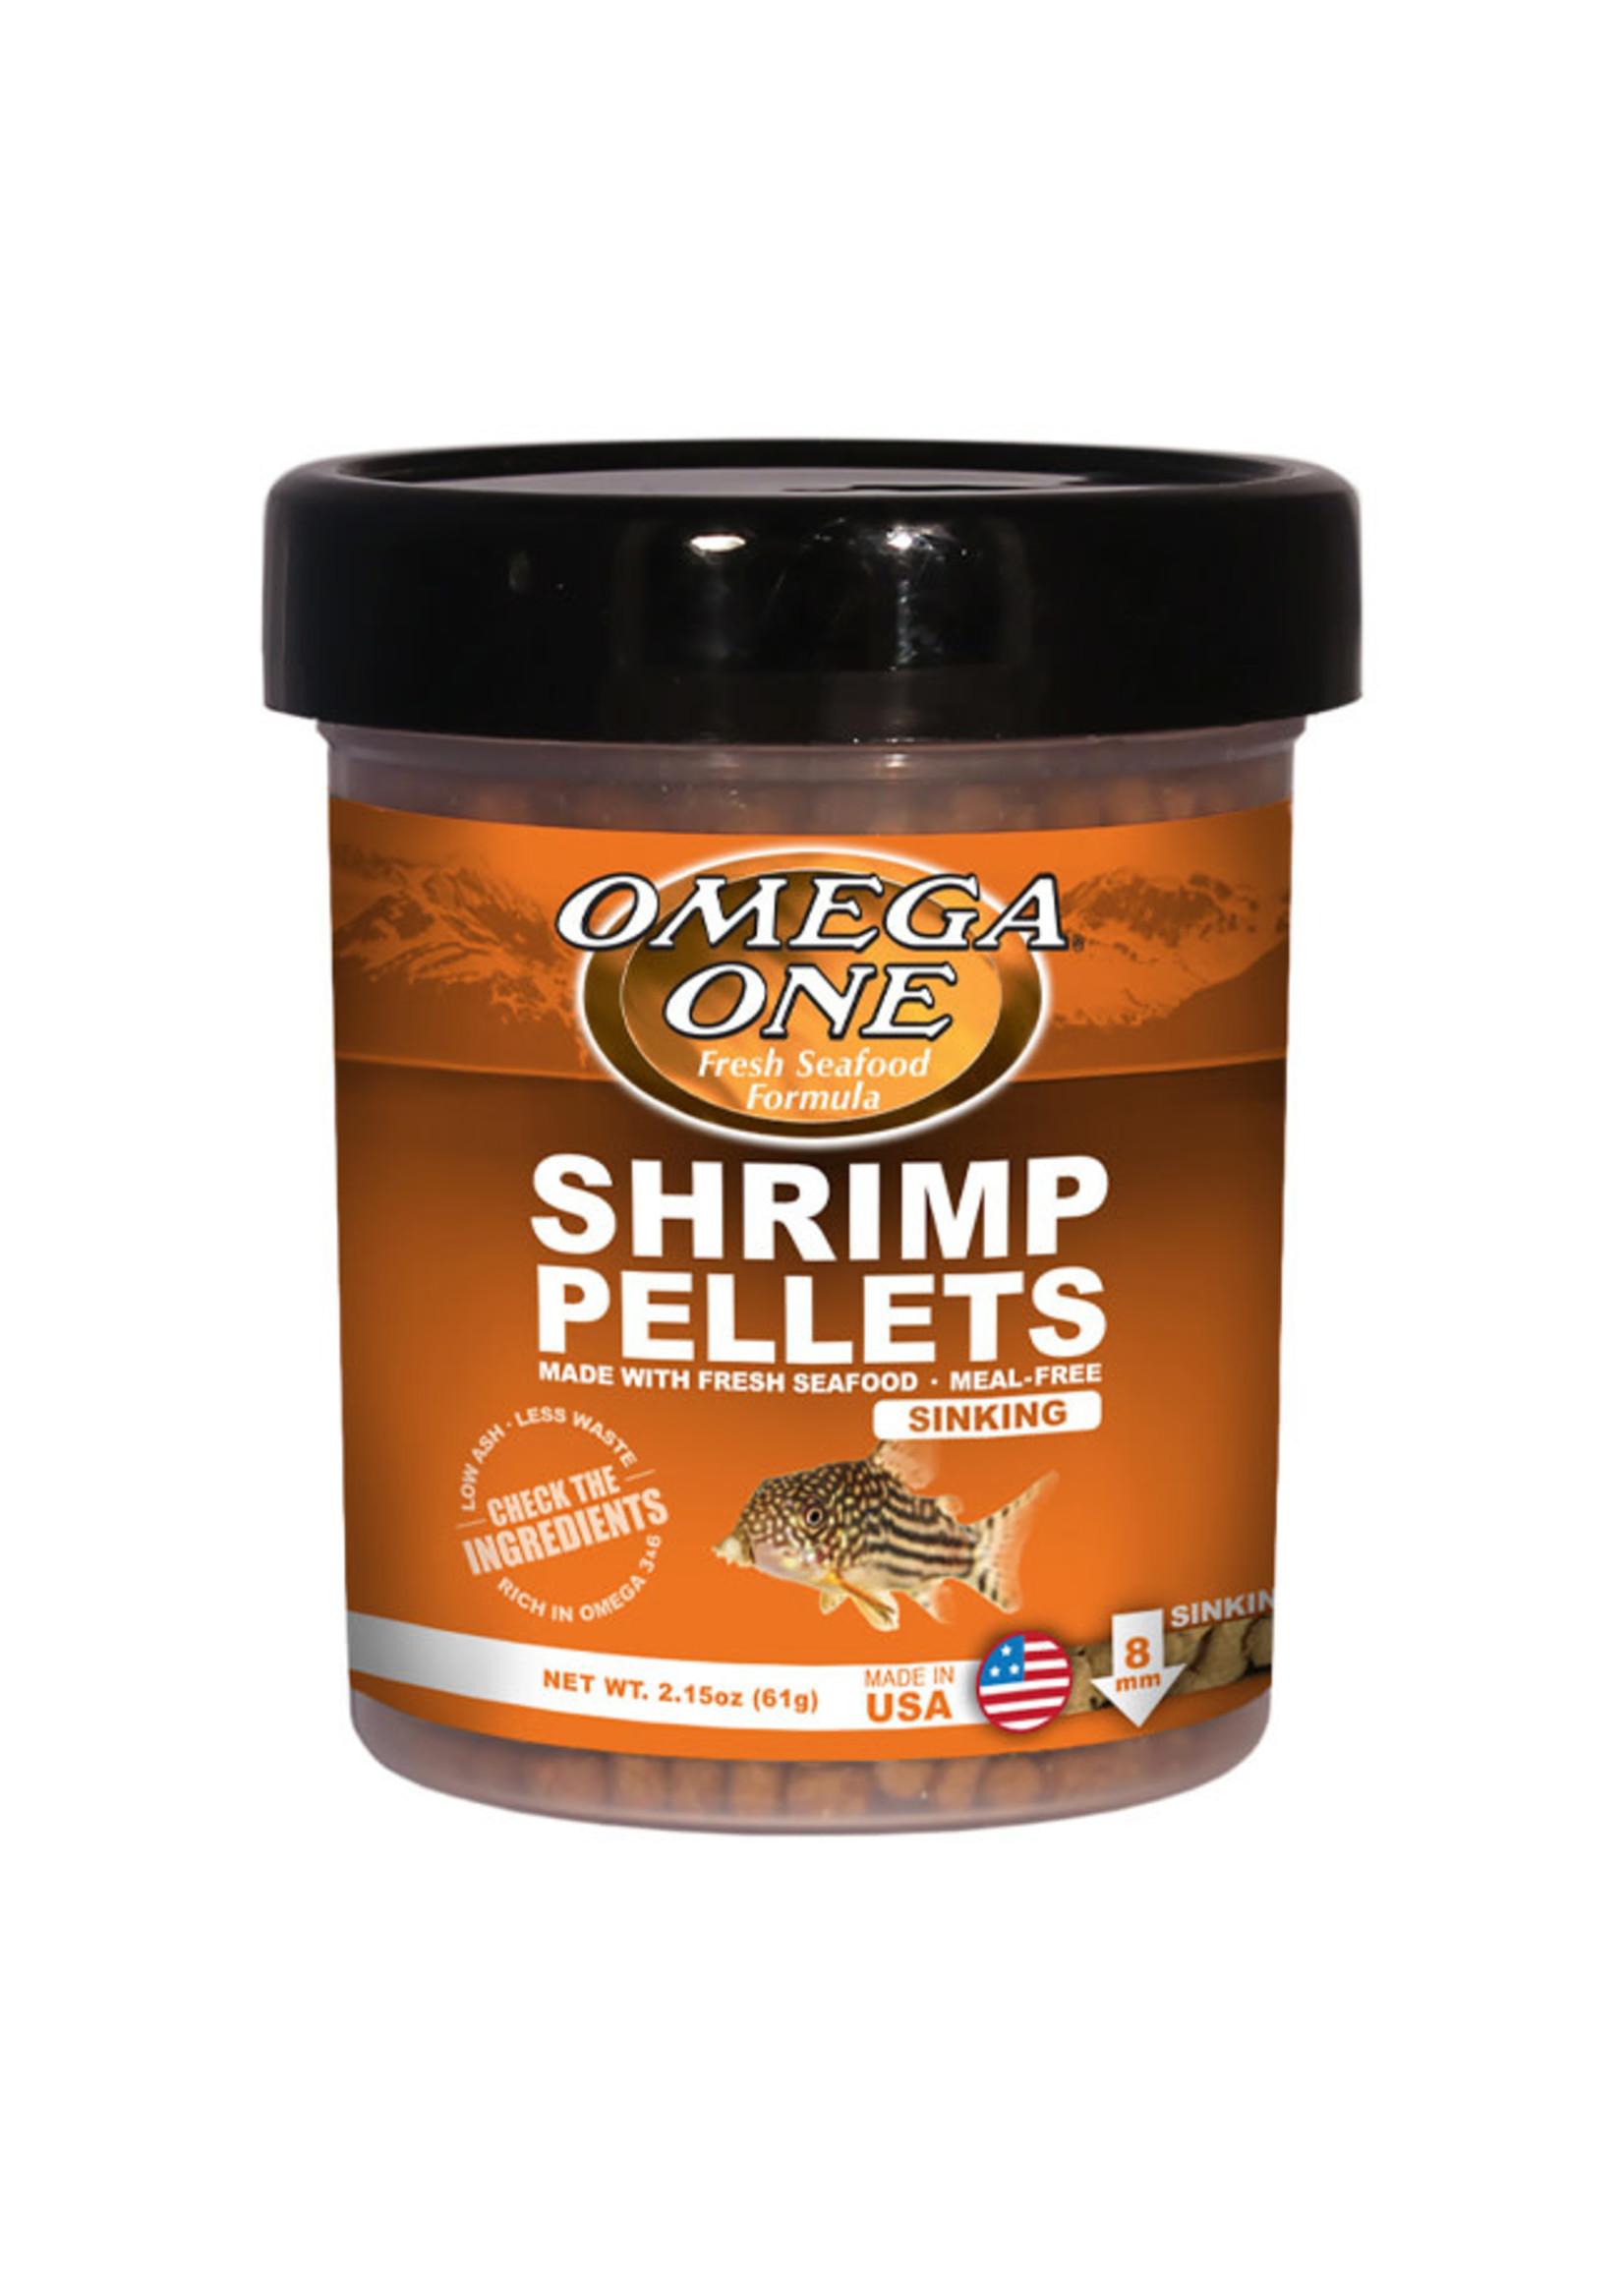 Omega One Omega One Shrimp Pellets